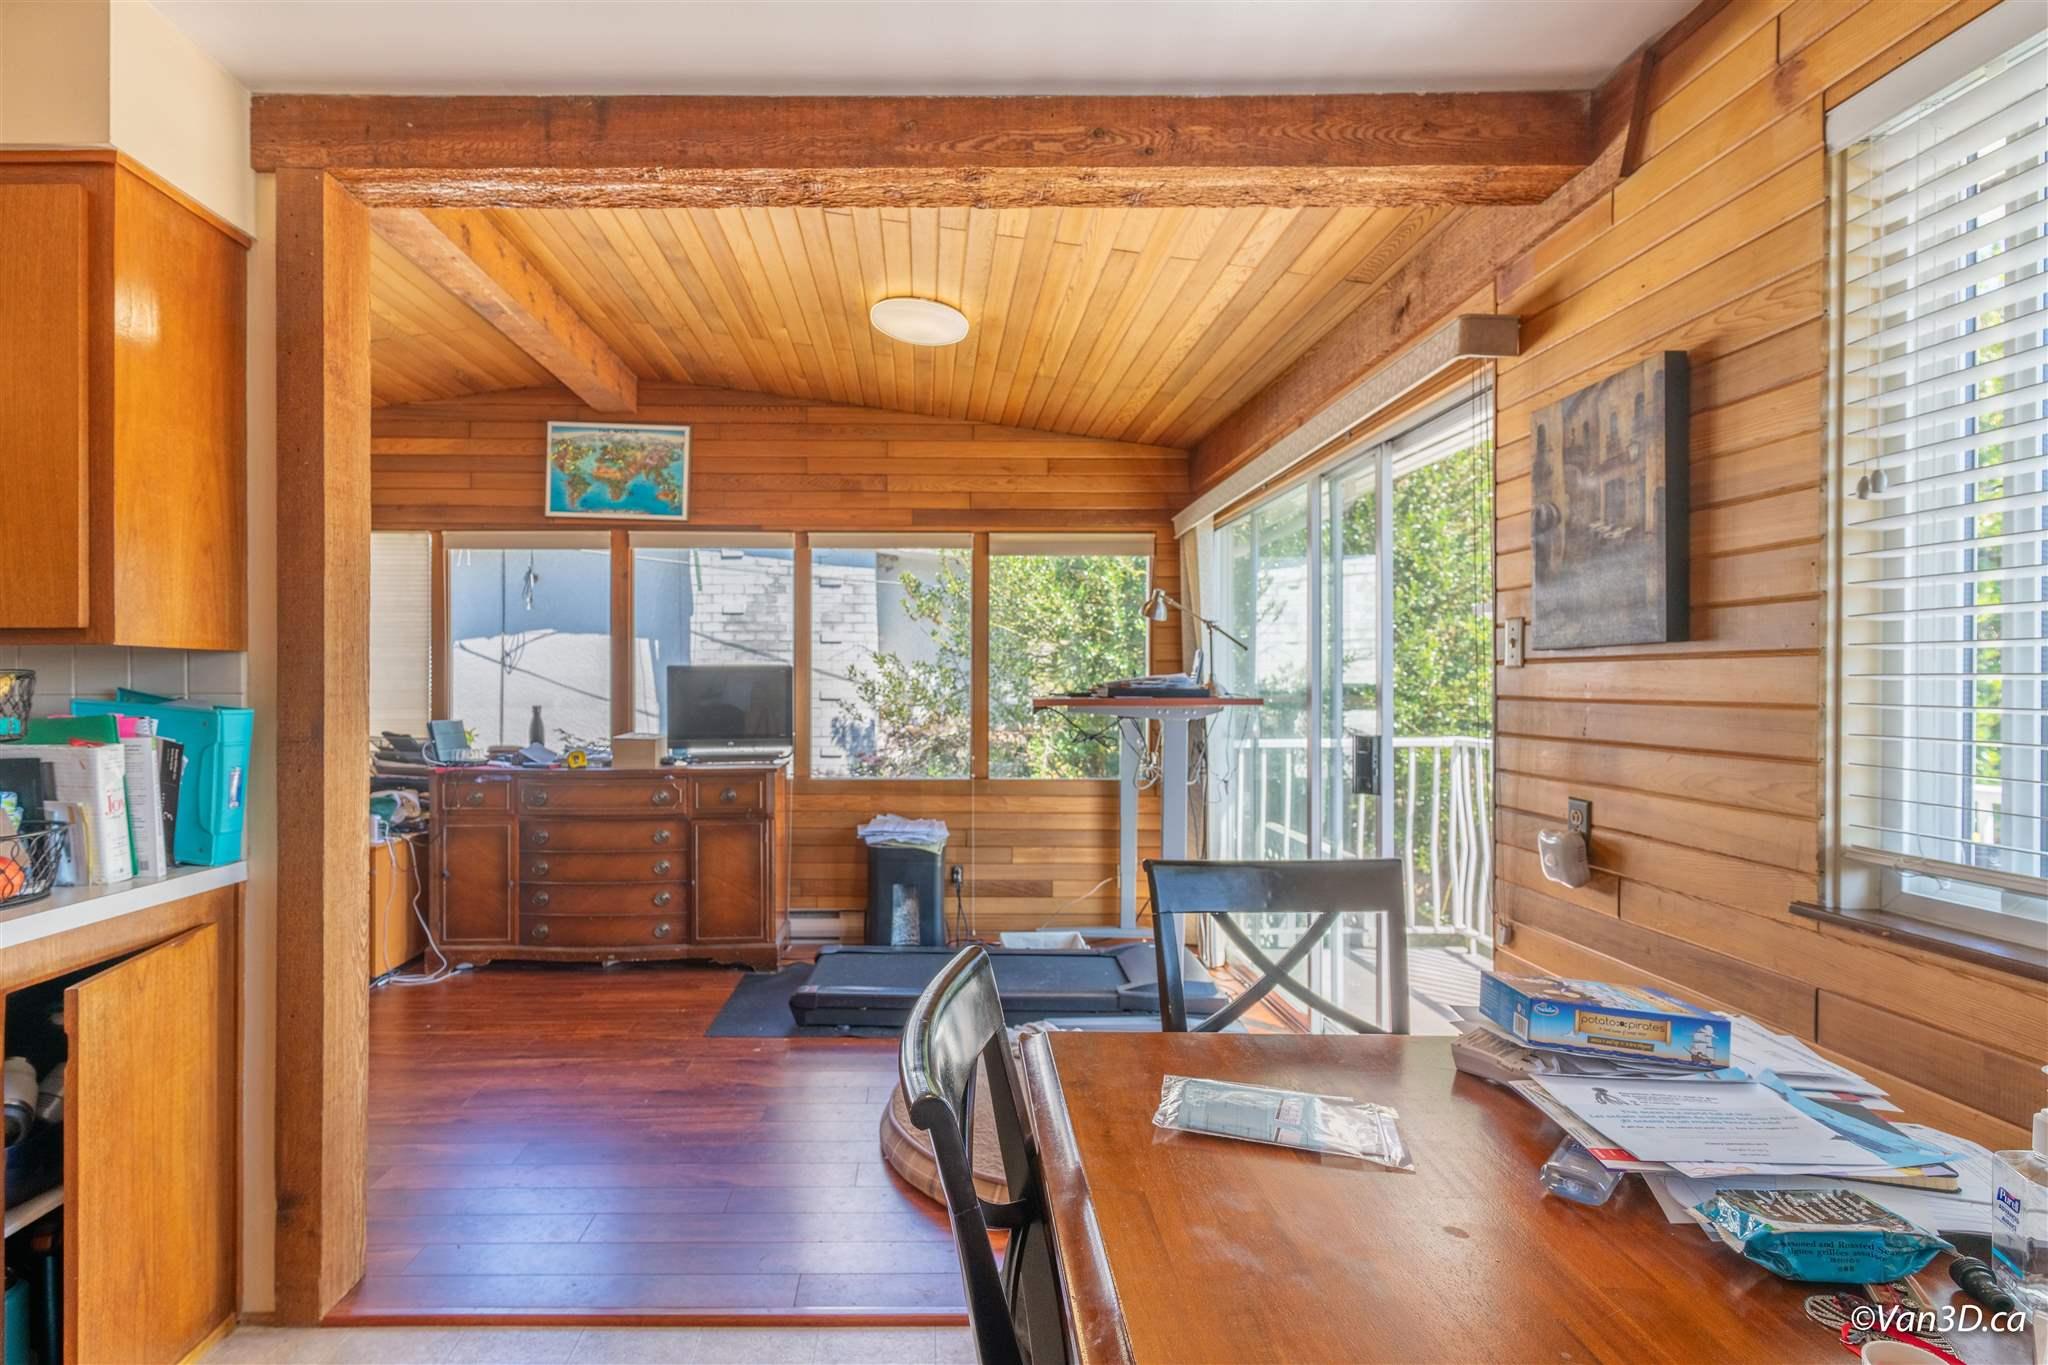 14495 MANN PARK CRESCENT - White Rock House/Single Family for sale, 4 Bedrooms (R2604561) - #24